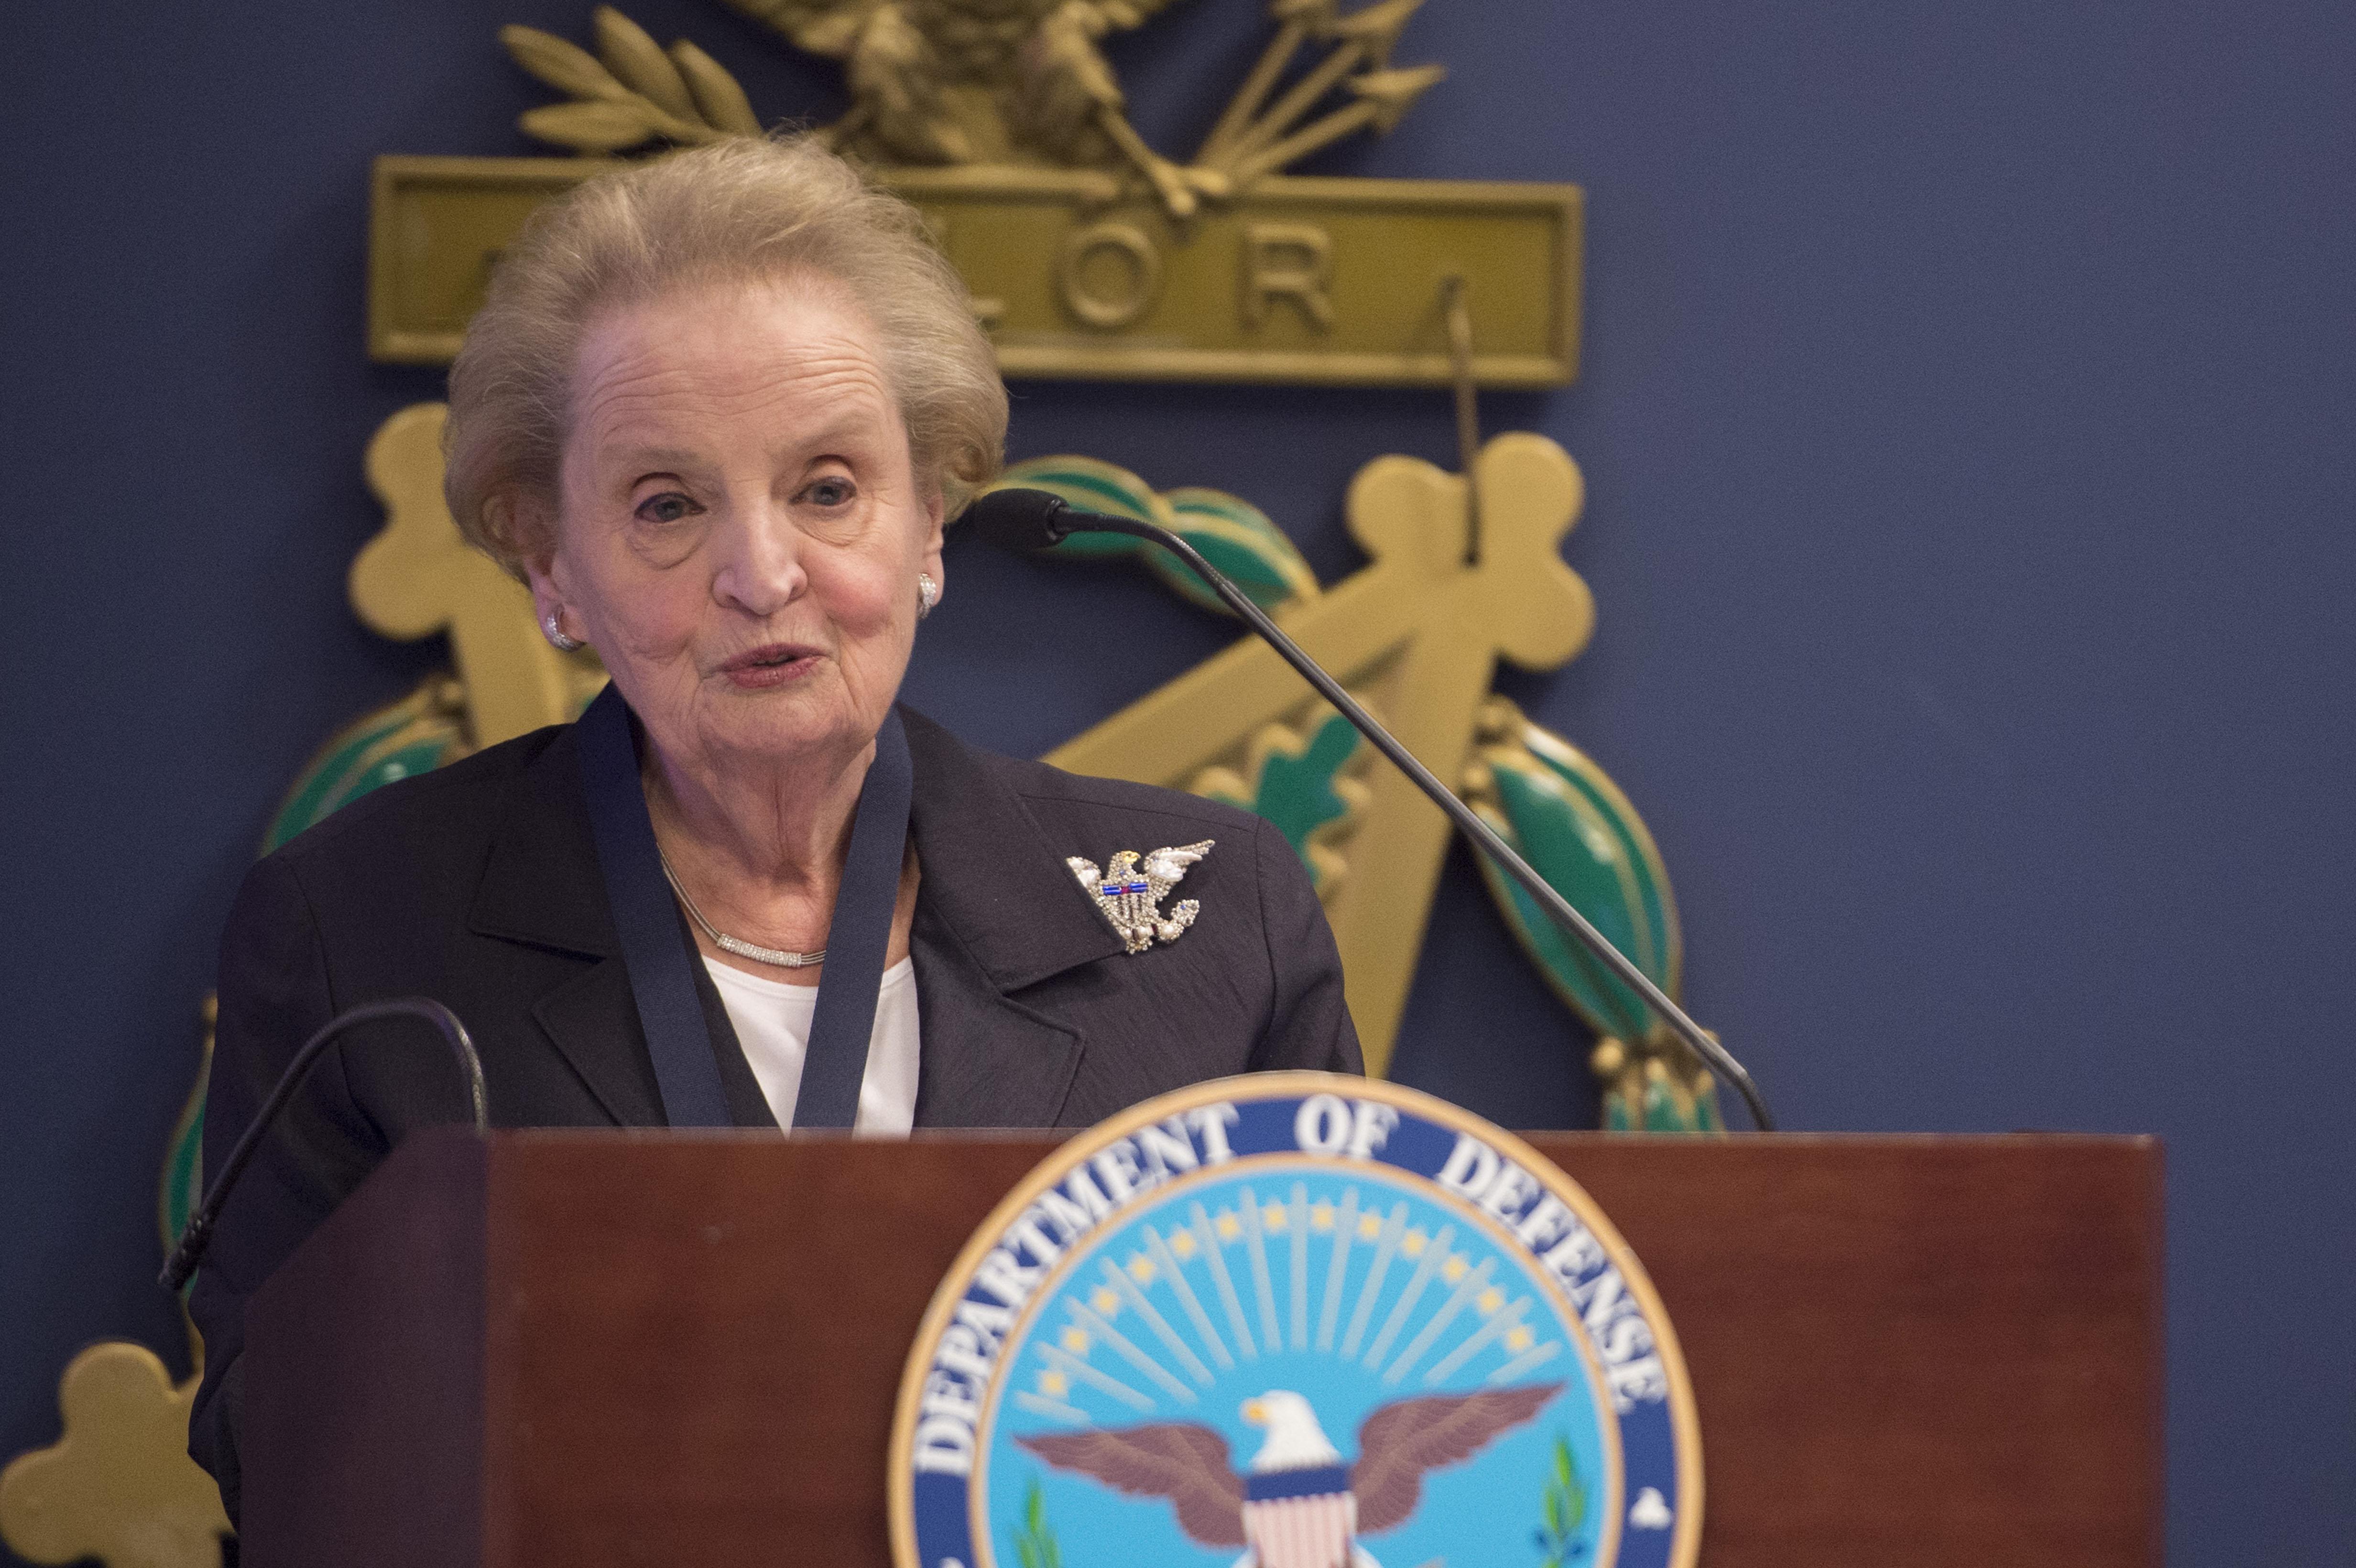 SD presents award to Madeleine Albright